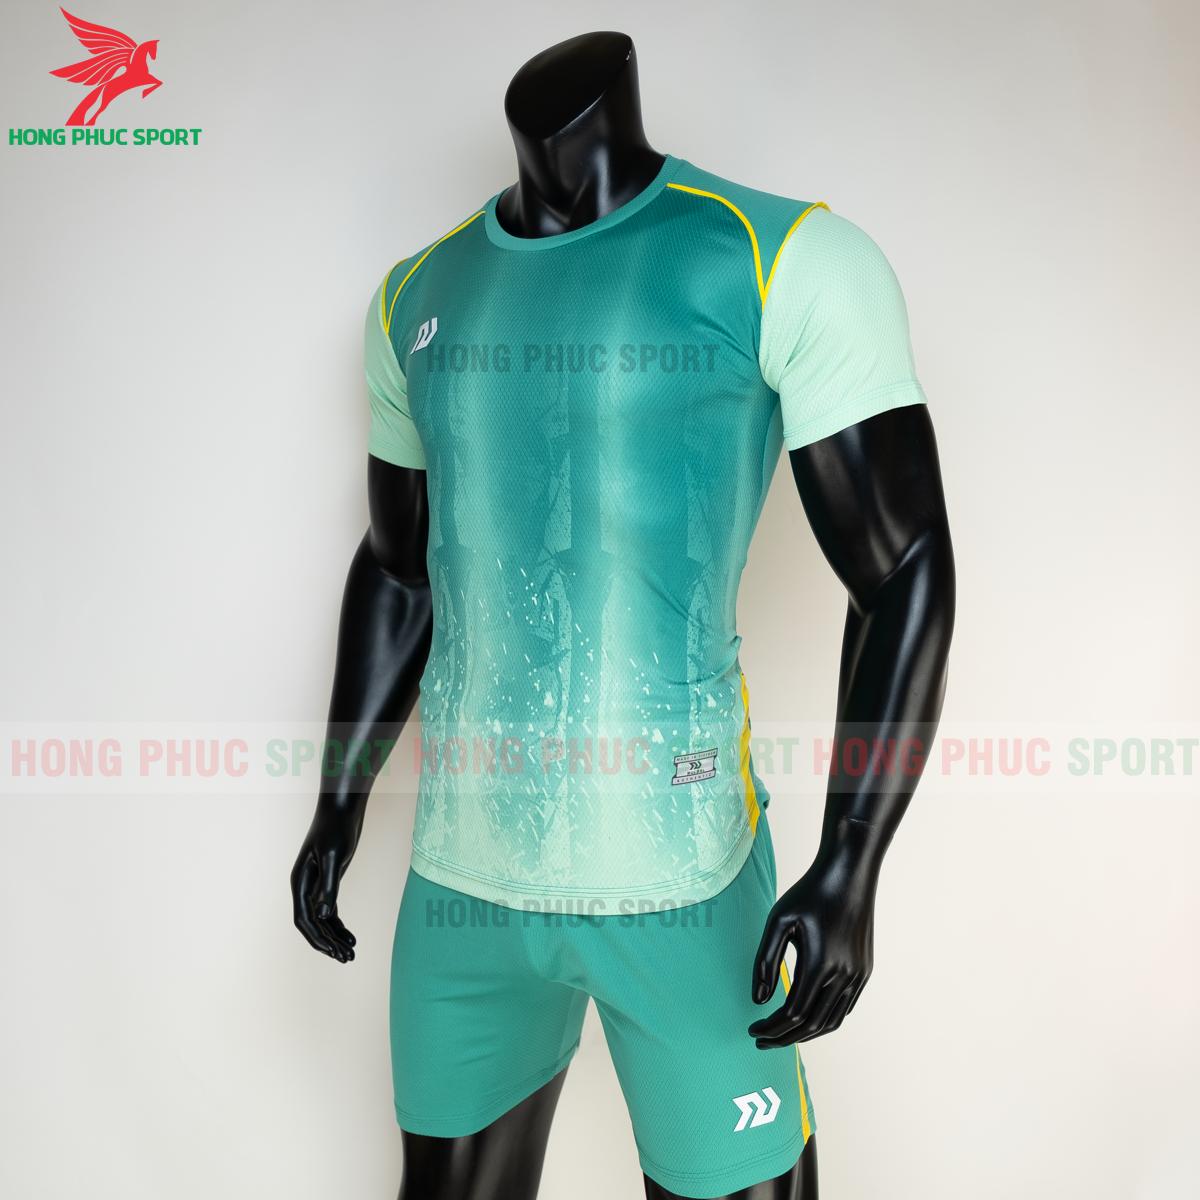 https://cdn.hongphucsport.com/unsafe/s4.shopbay.vn/files/285/ao-bong-da-khong-logo-bulbal-hades-mau-xanh-la-4-604f344e83db2.png